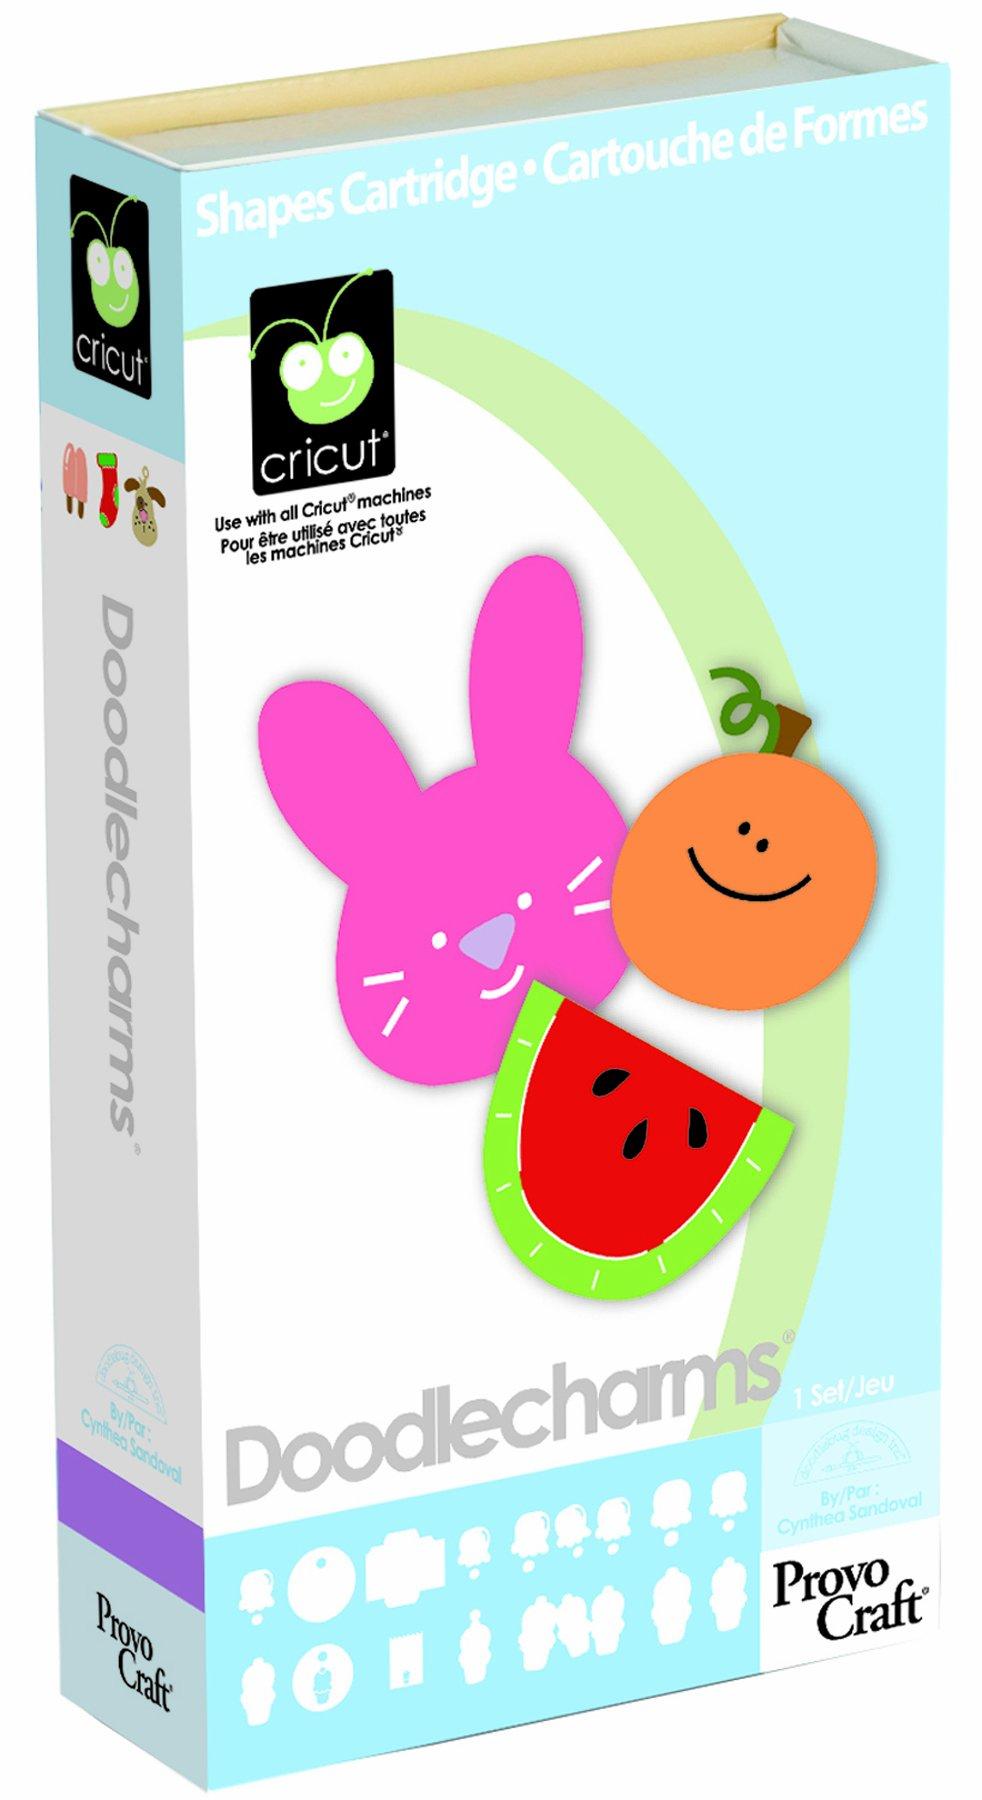 Cricut Doodlecharm Cartridge, 50 Assorted Designs product image